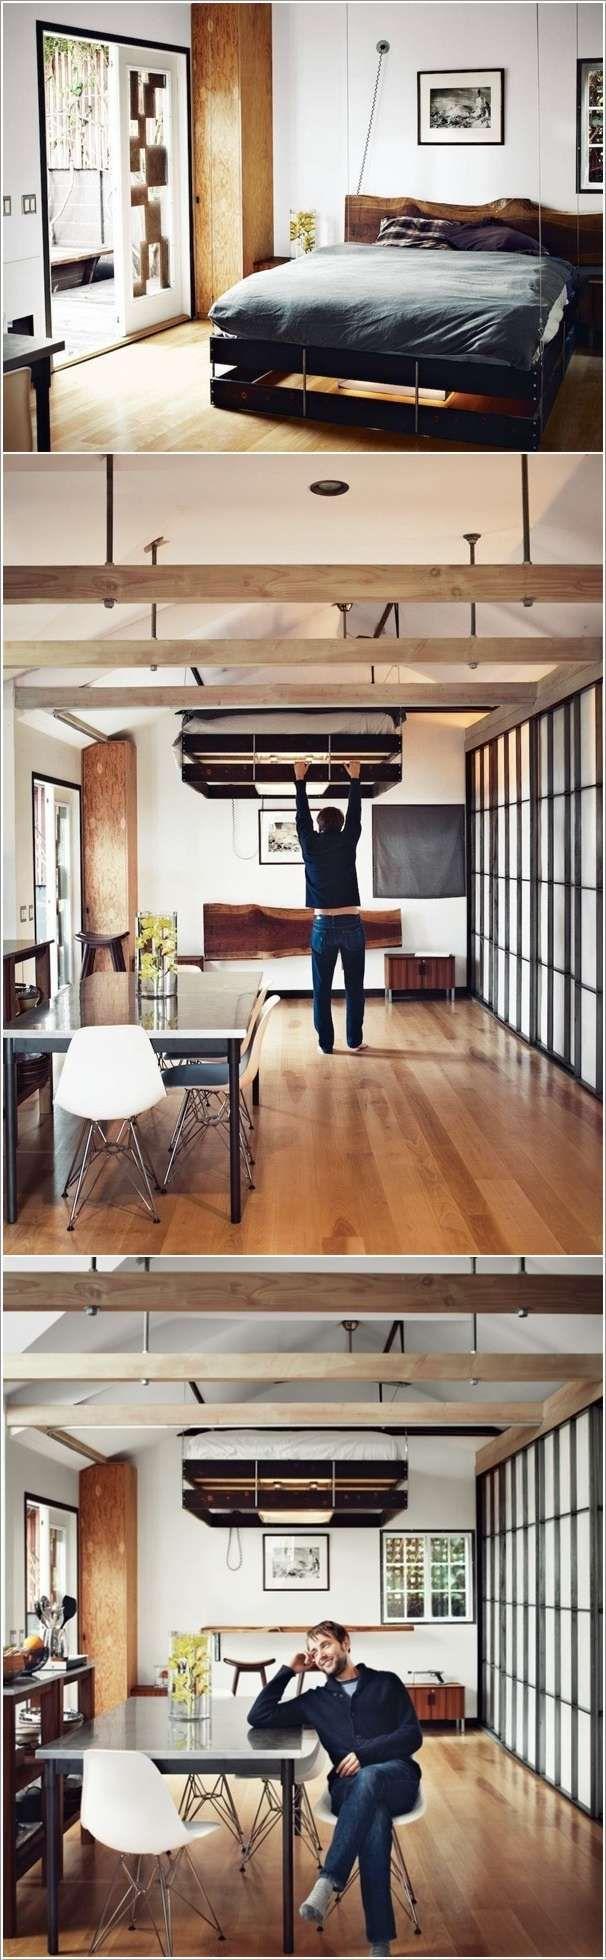 The 25 best meuble salle manger ideas on pinterest - Table a manger retractable ...